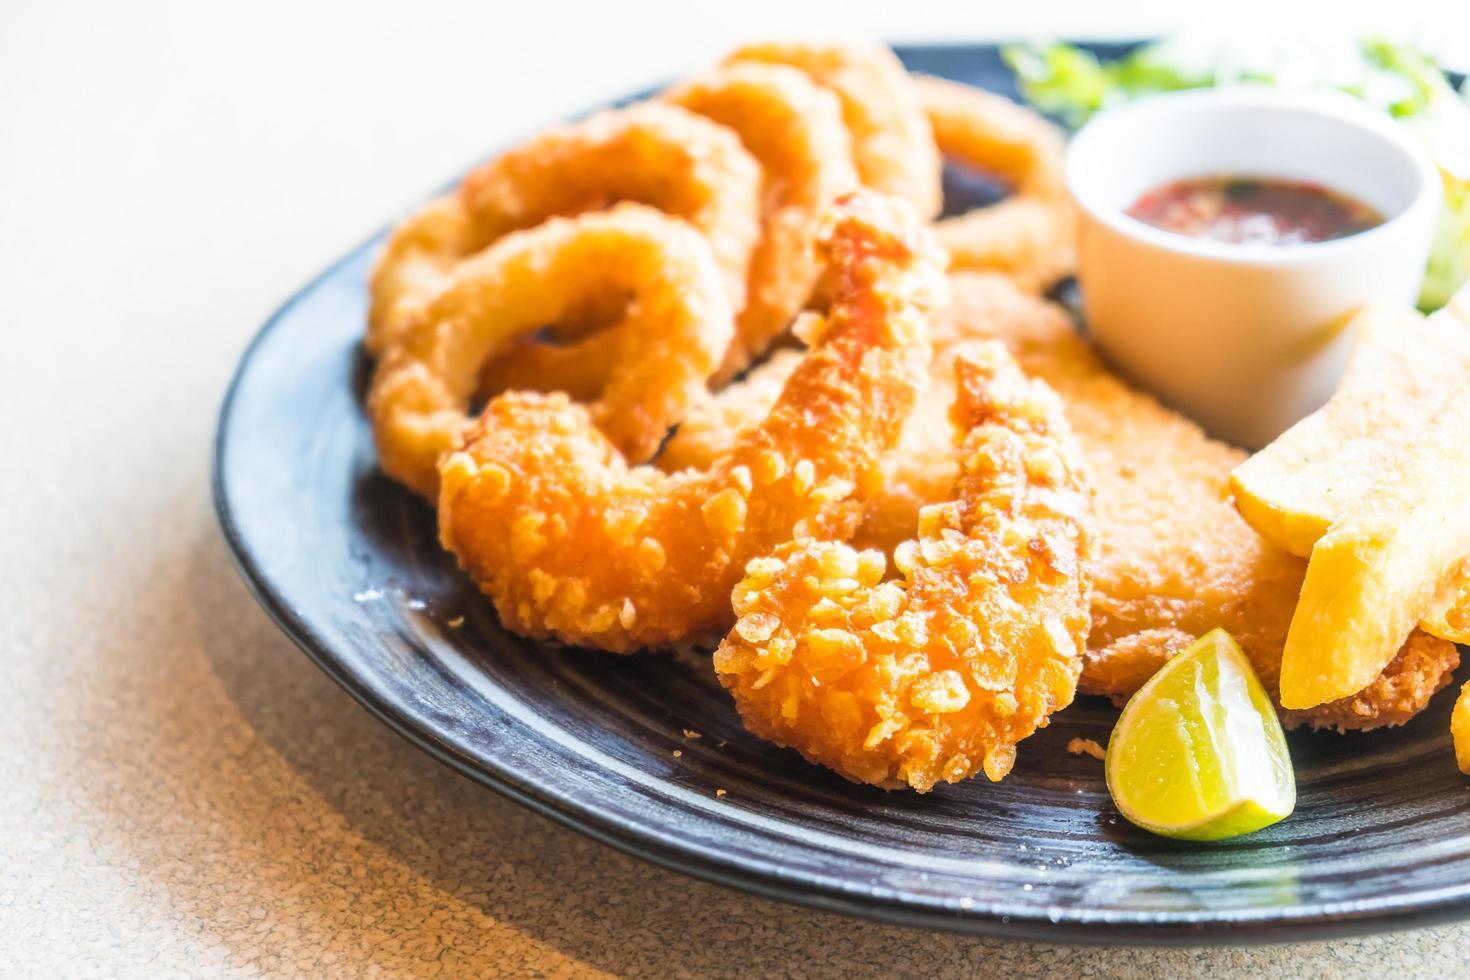 Fried Seafood platter photo